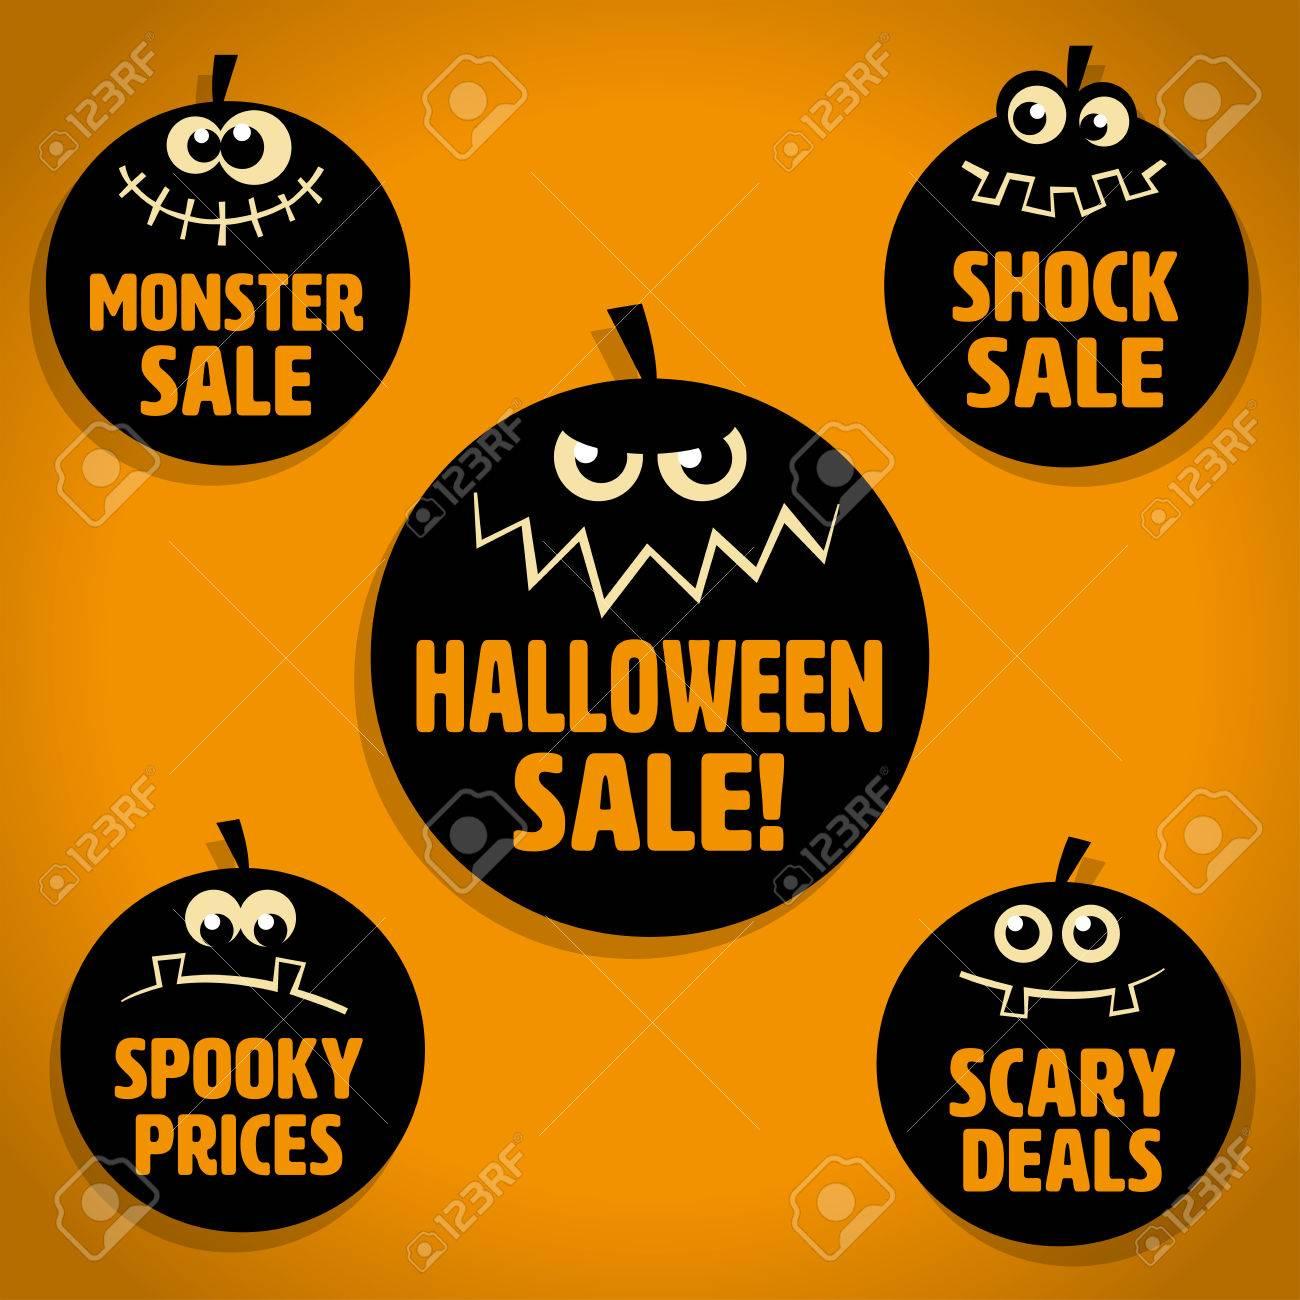 ᐈ Halloween for sale stock illustrations, Royalty Free halloween sale  vectors | download on Depositphotos®